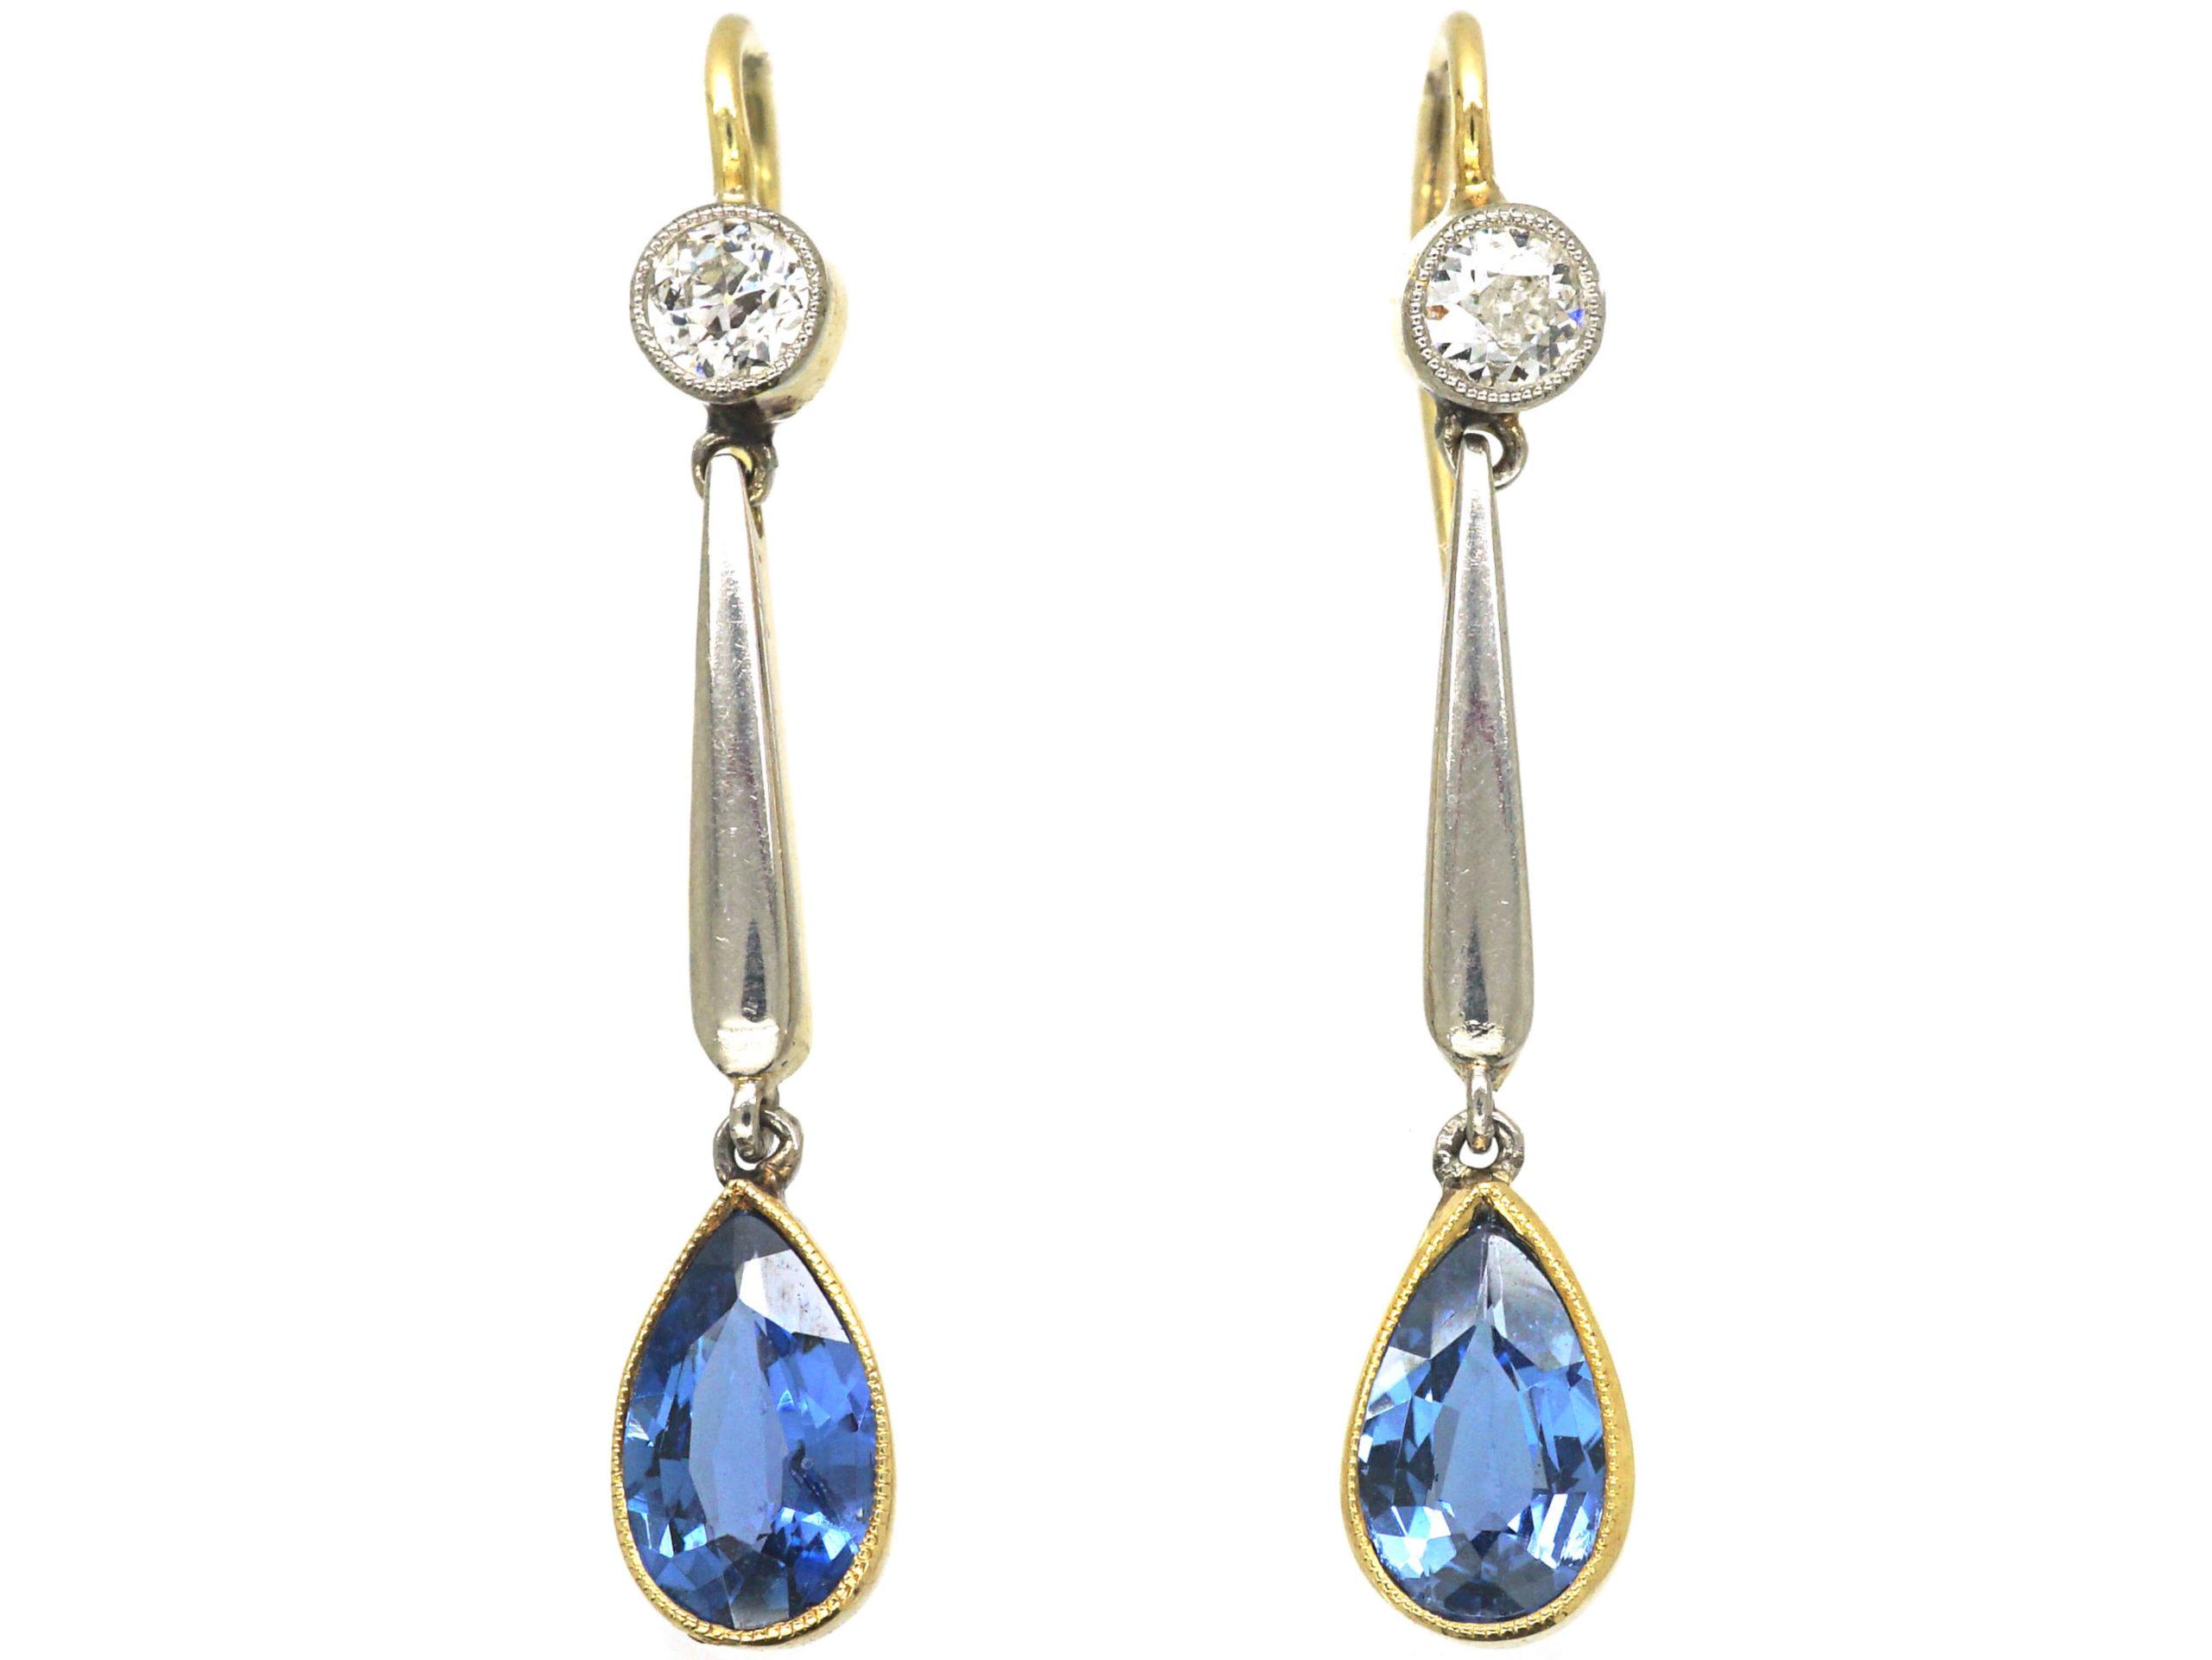 Edwardian 15ct Gold & Platinum, Sapphire & Diamond Drop Earrings